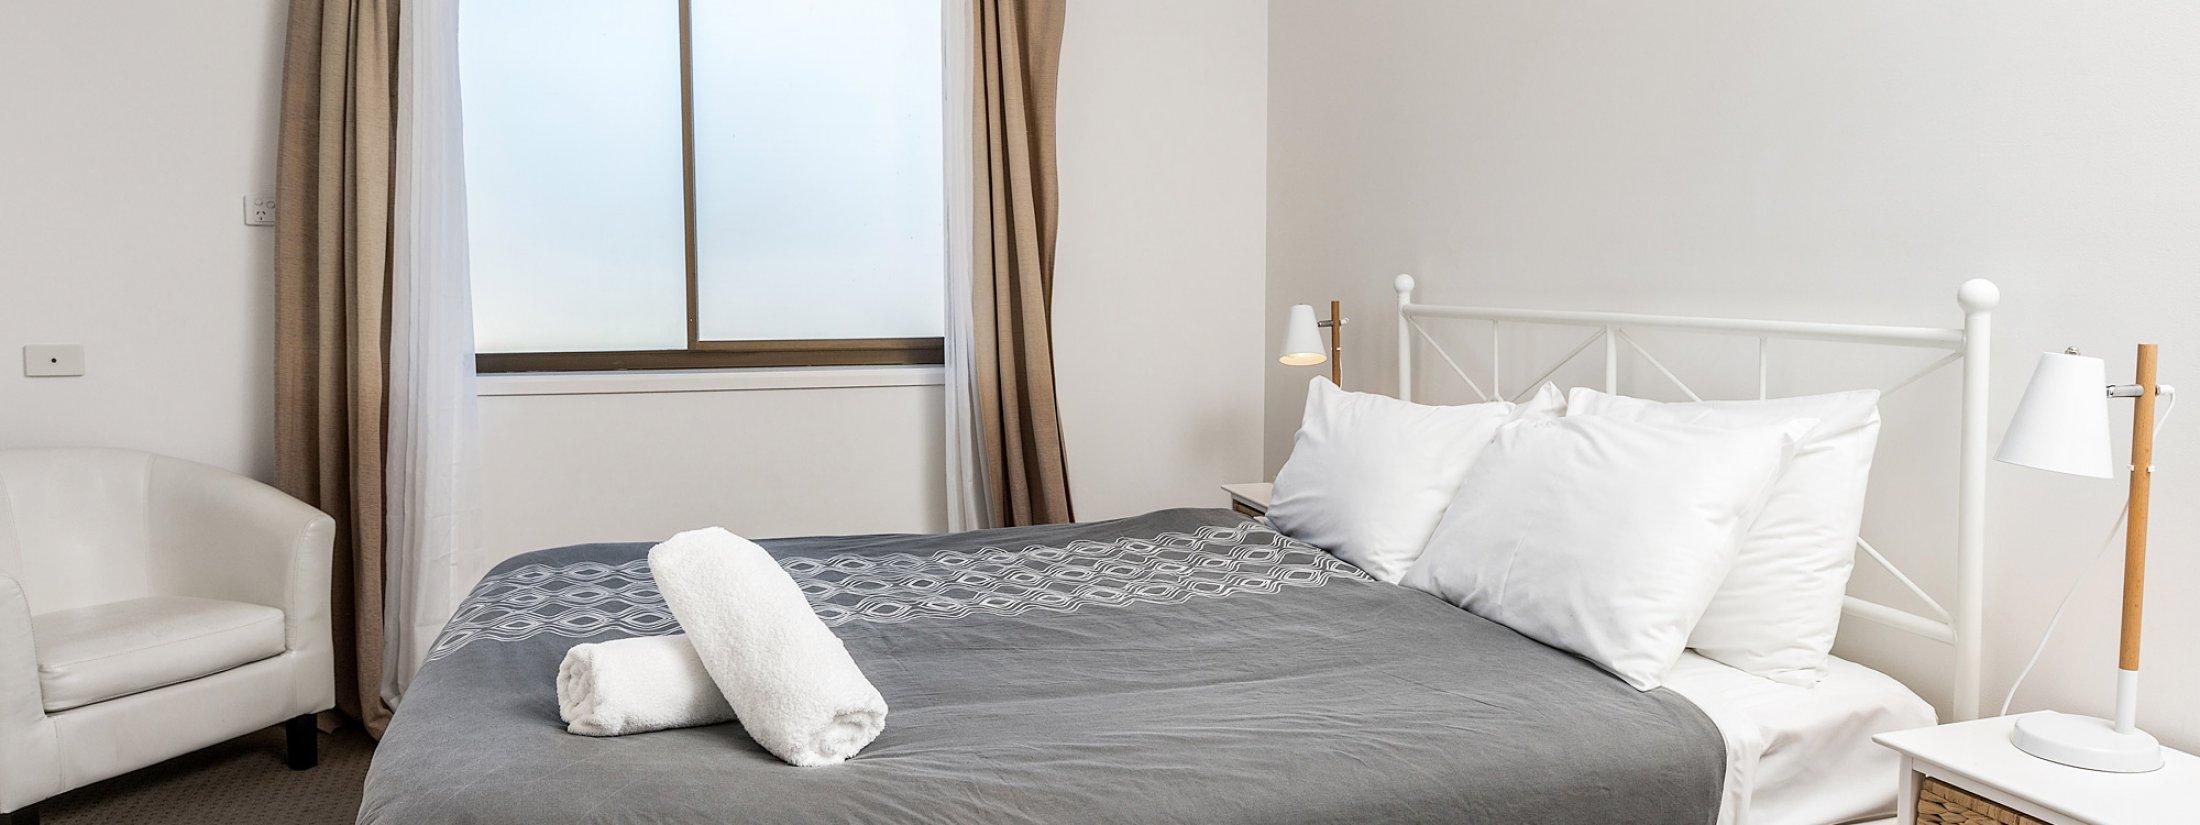 Bella on Banyan - Gold Coast - Bedroom 2